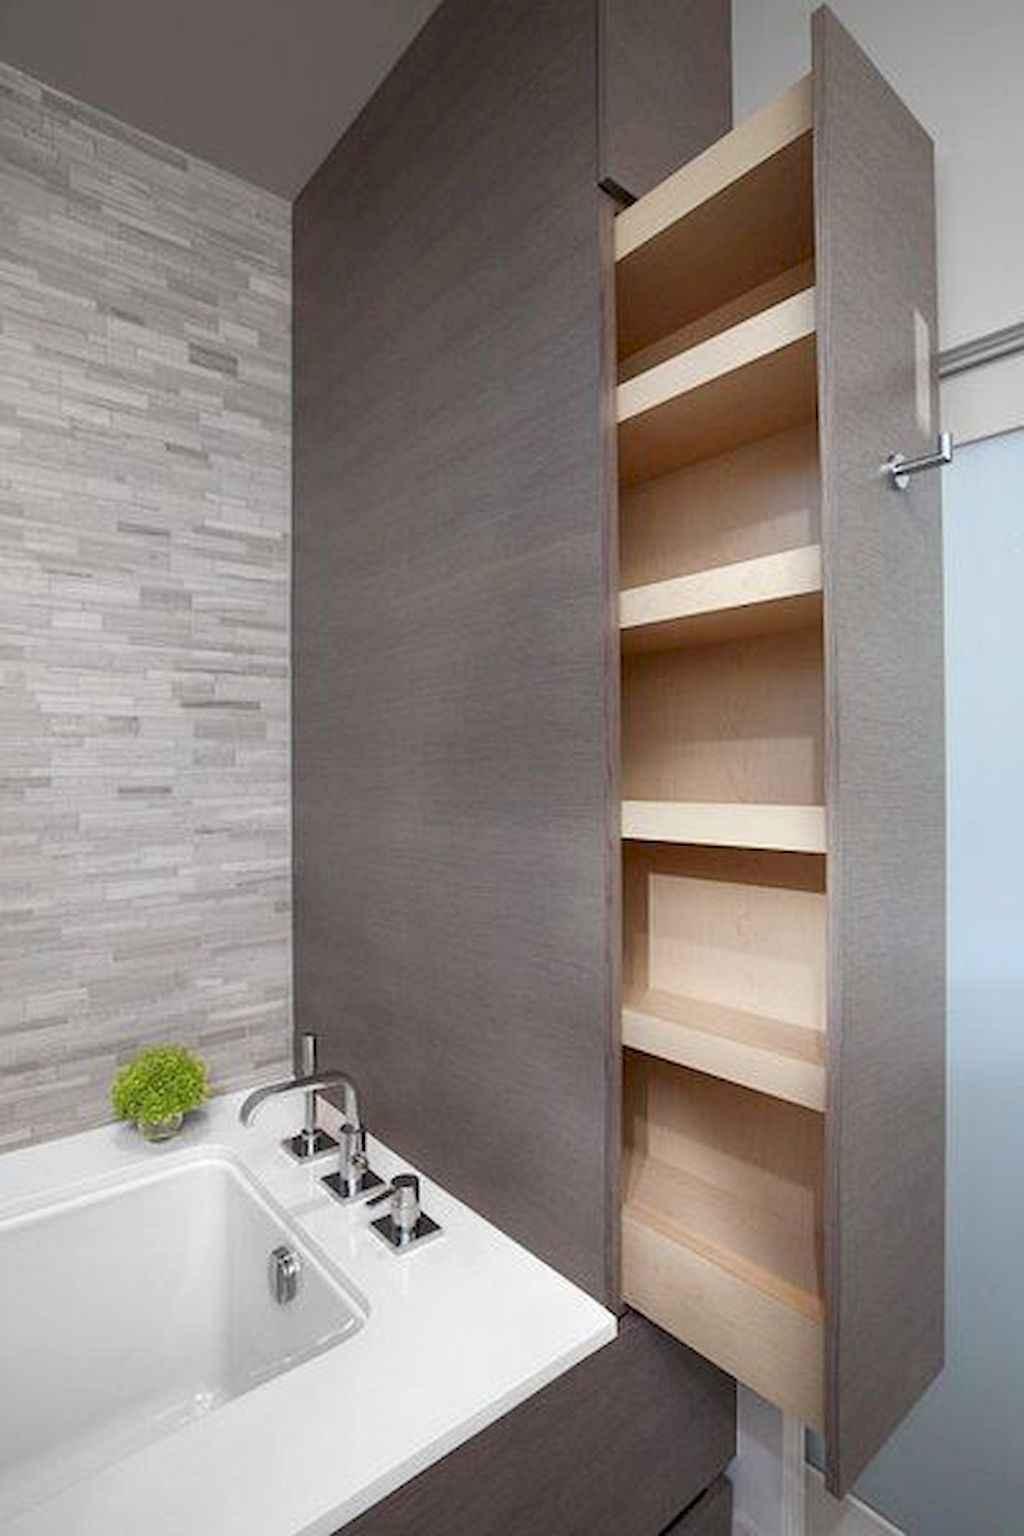 111 Brilliant Small Bathroom Remodel Ideas On A Budget (74)